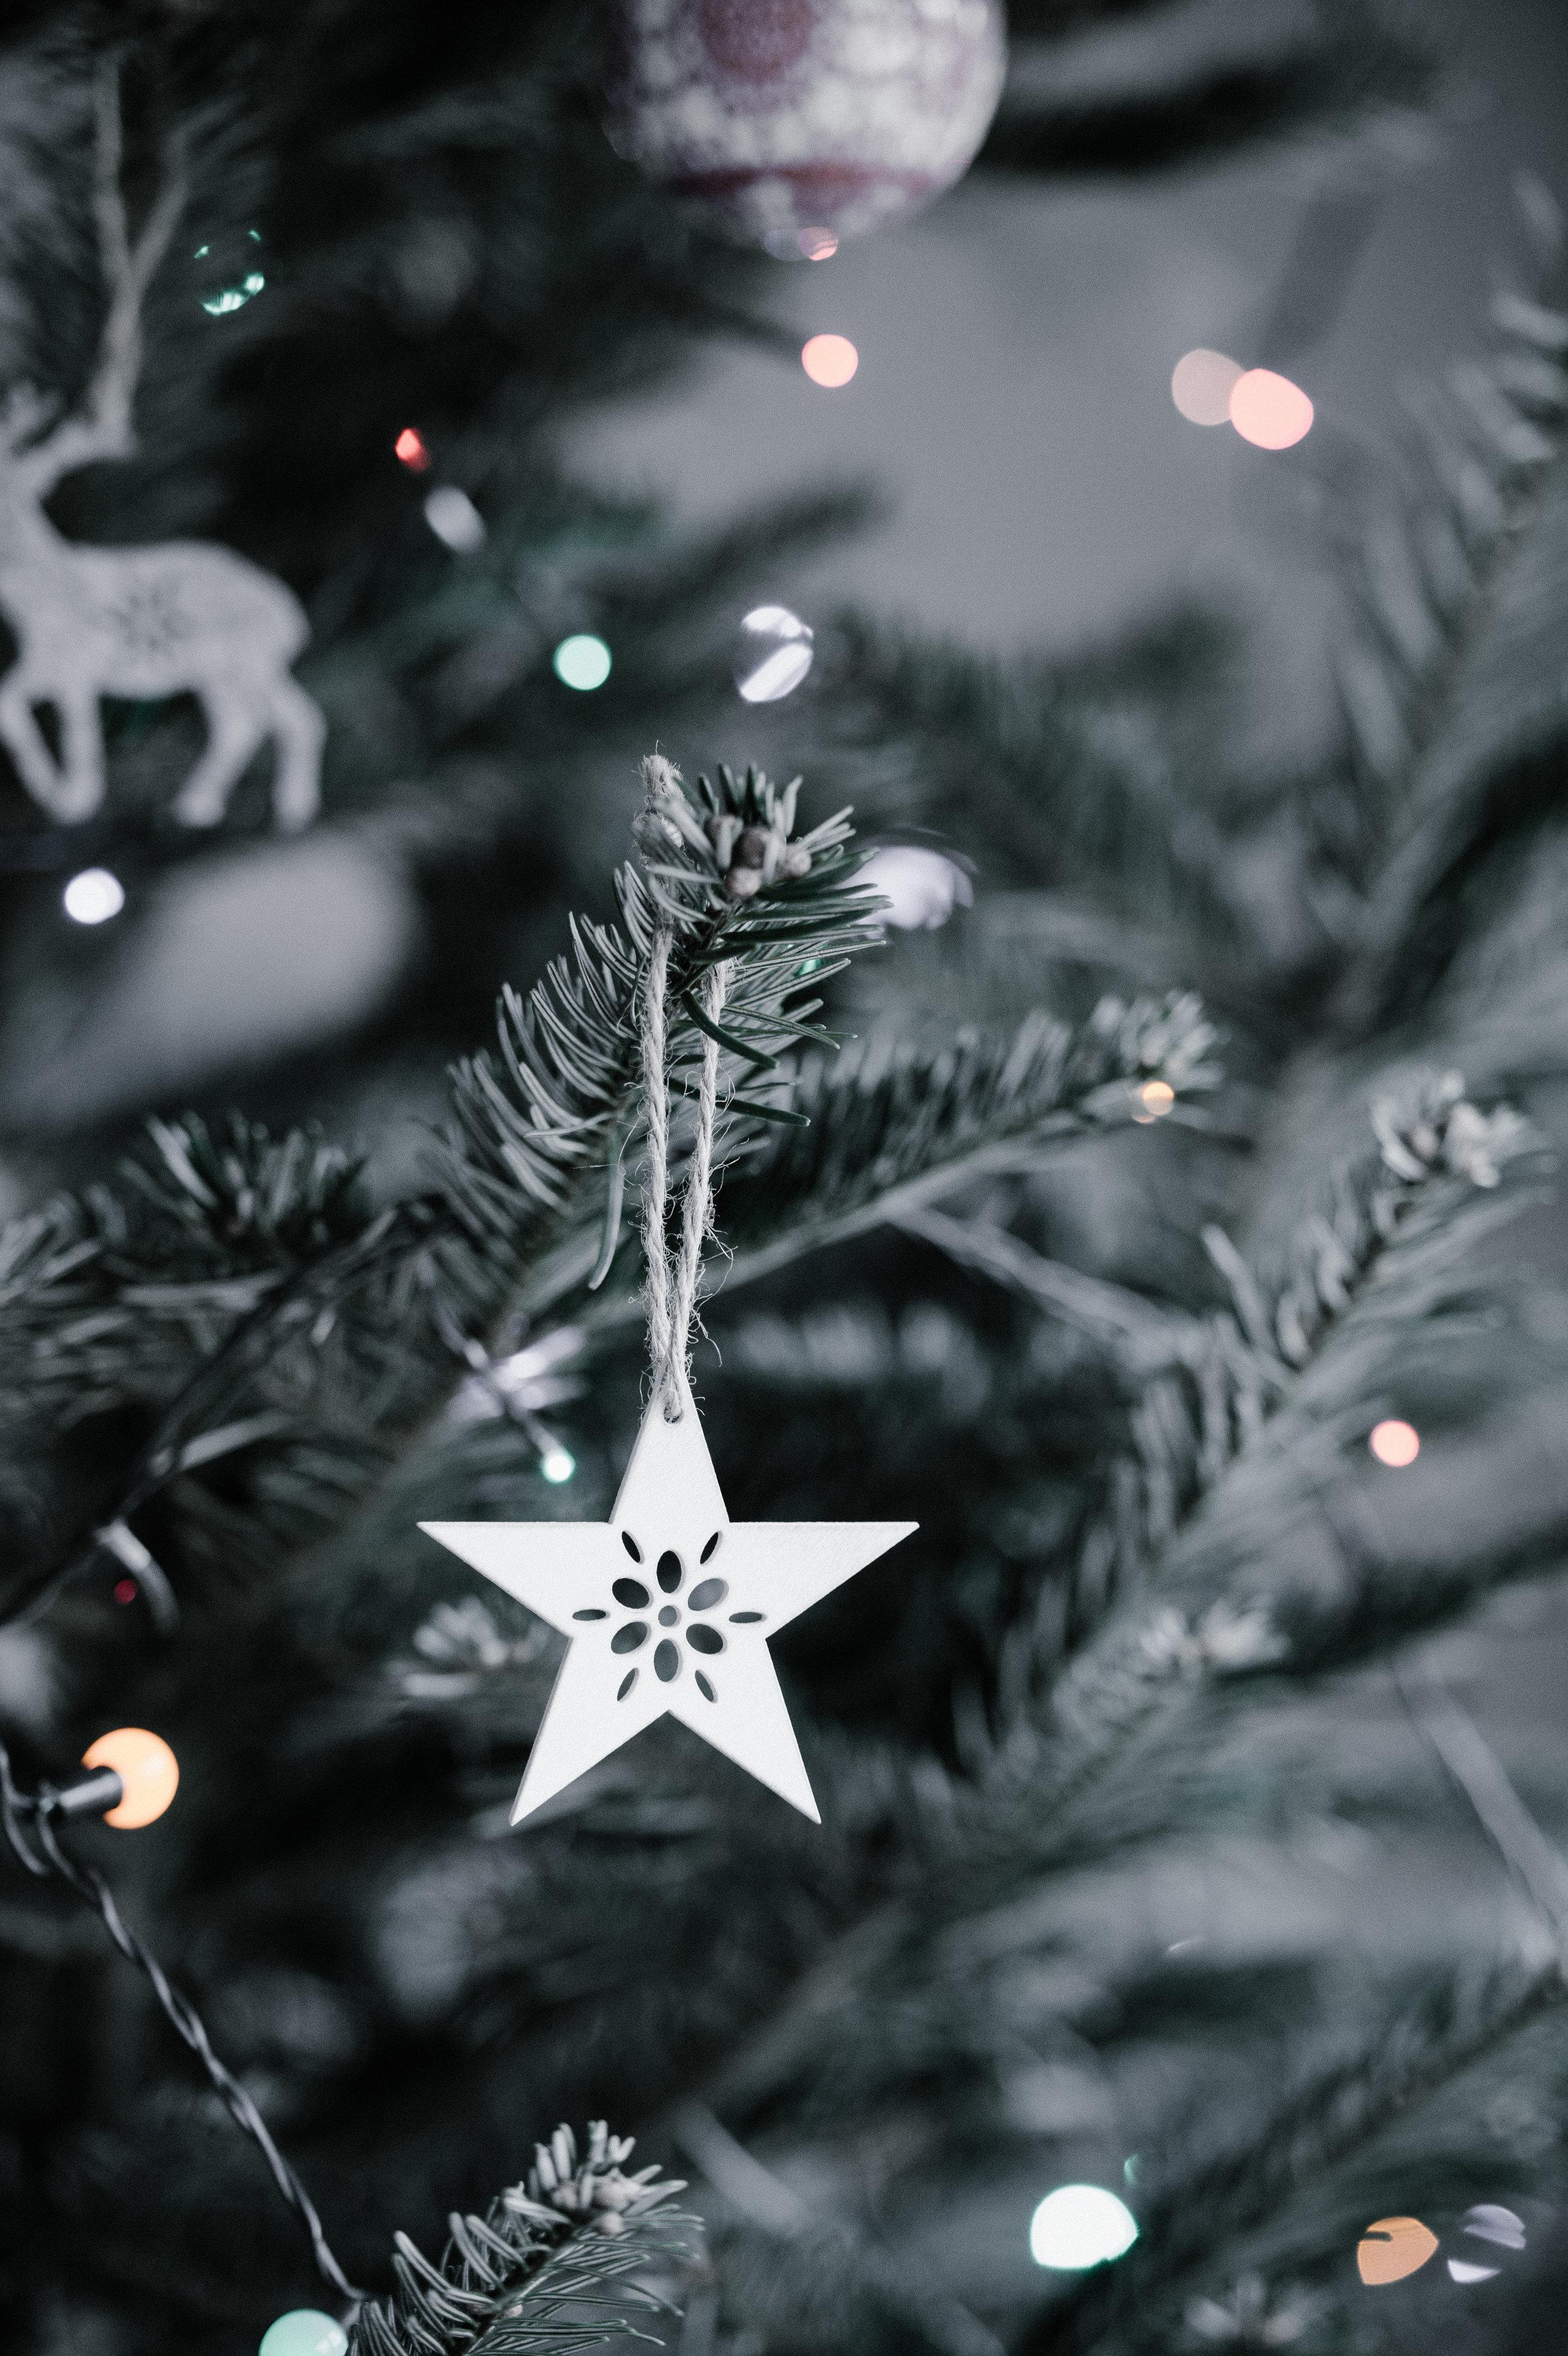 Christmas Carol Concert - Sunday 16th December, 7.30pm College Theatre, P.B.C., The Mardyke